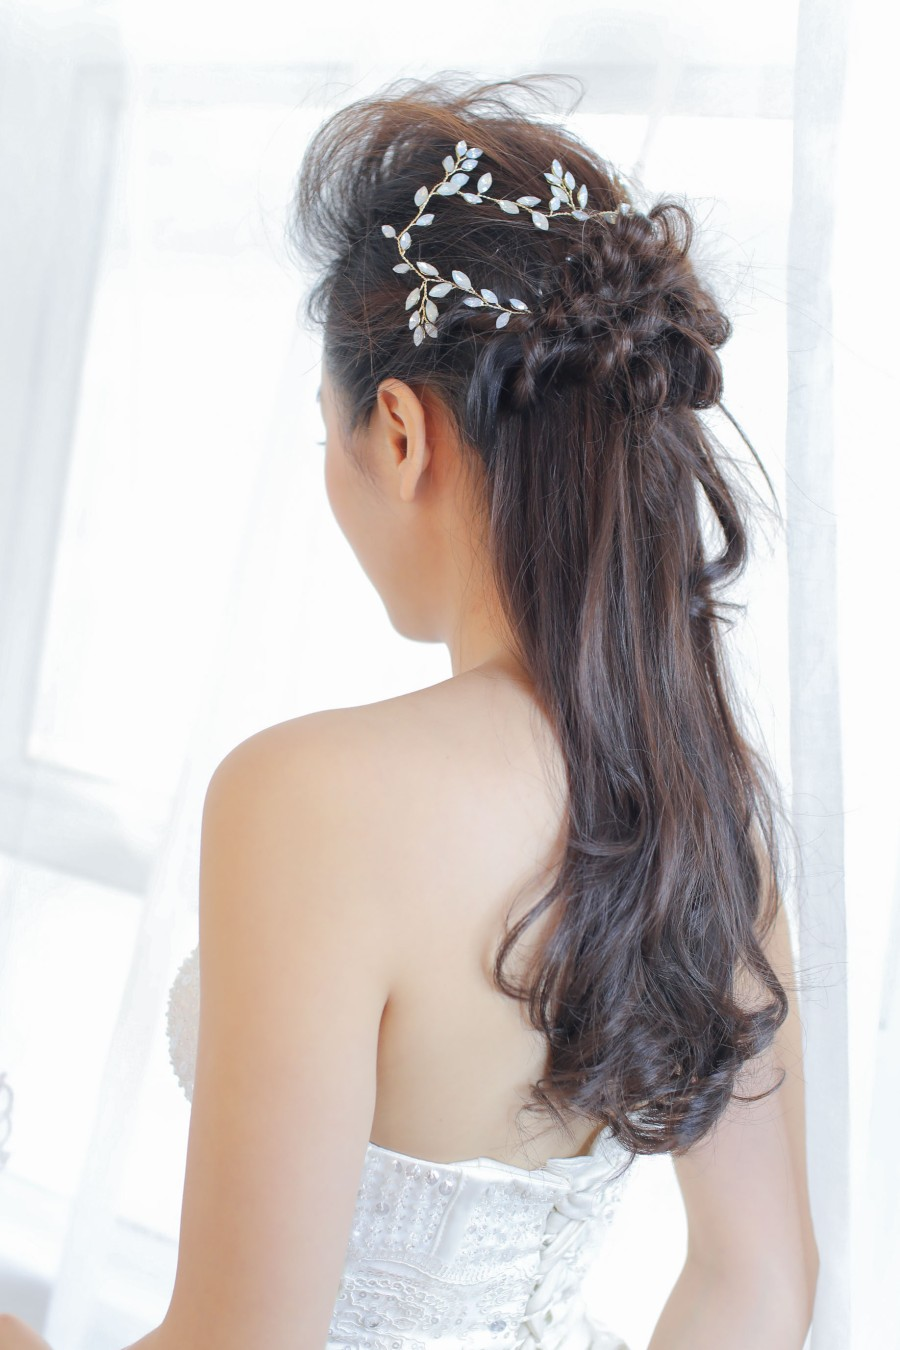 韓式新娘化妝髮型攝影_bridal_wedding_Korea_makeup_hairstyling_Top_MUA_paulstylist_photography_hk_stephanie-12